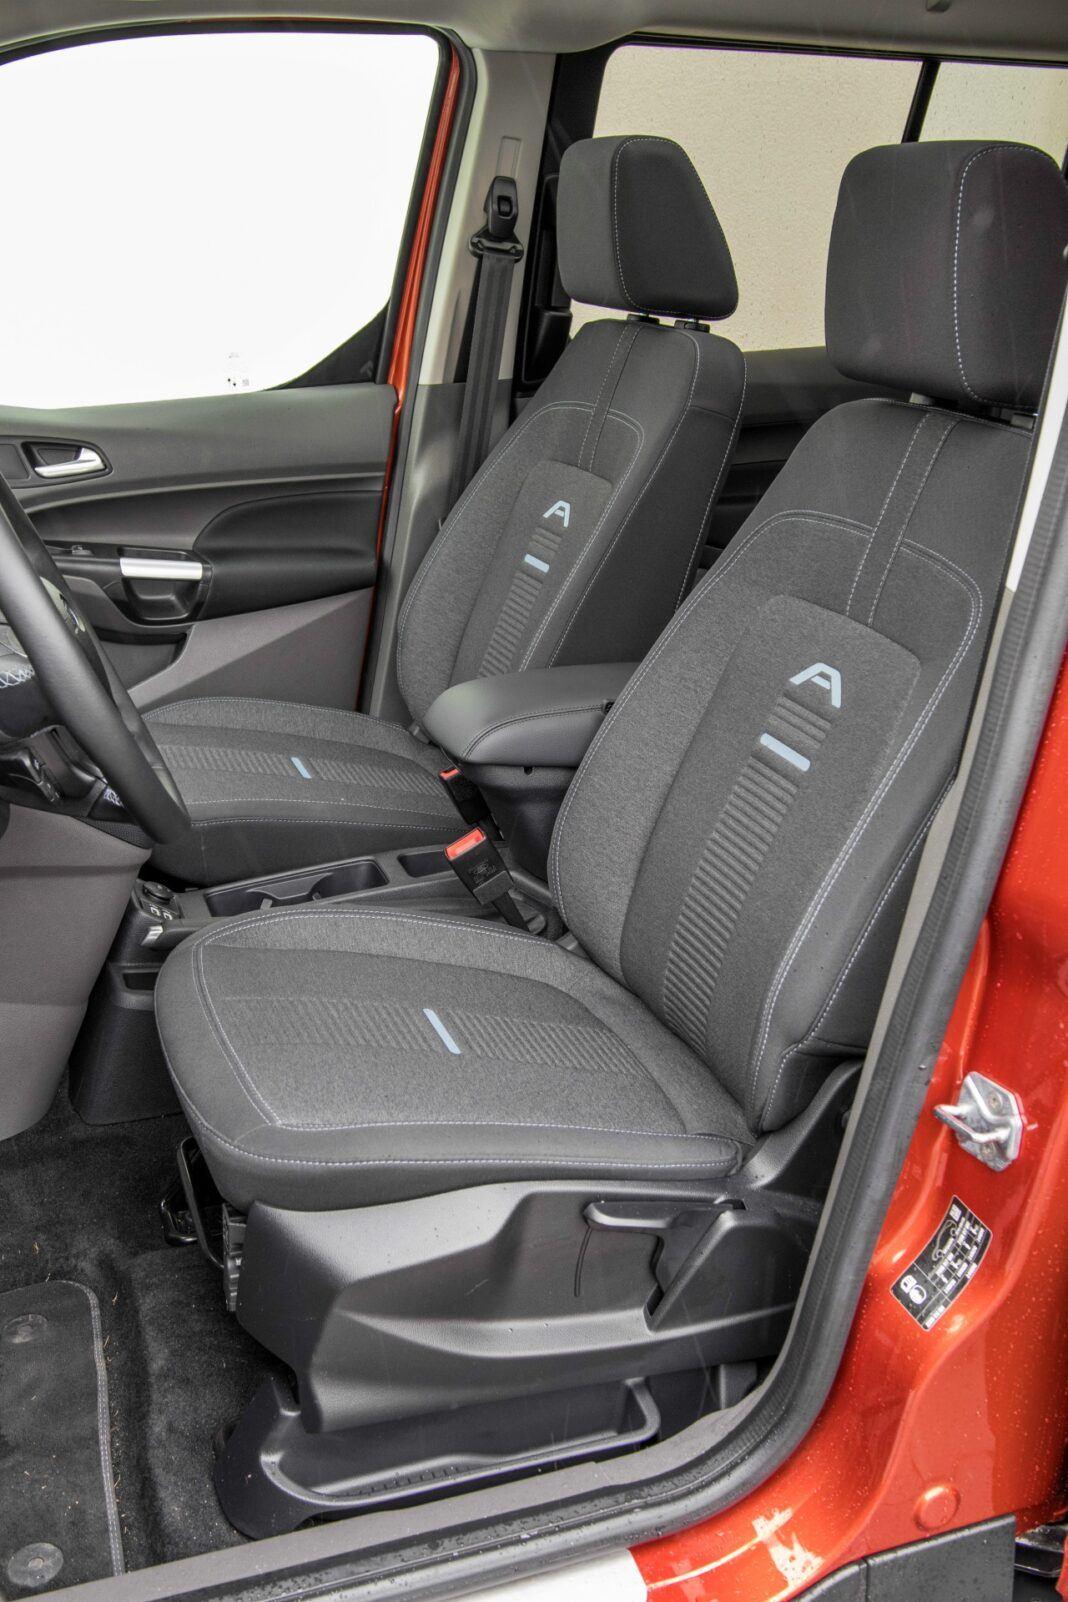 Ford Grand Tourneo Connect - siedzenia